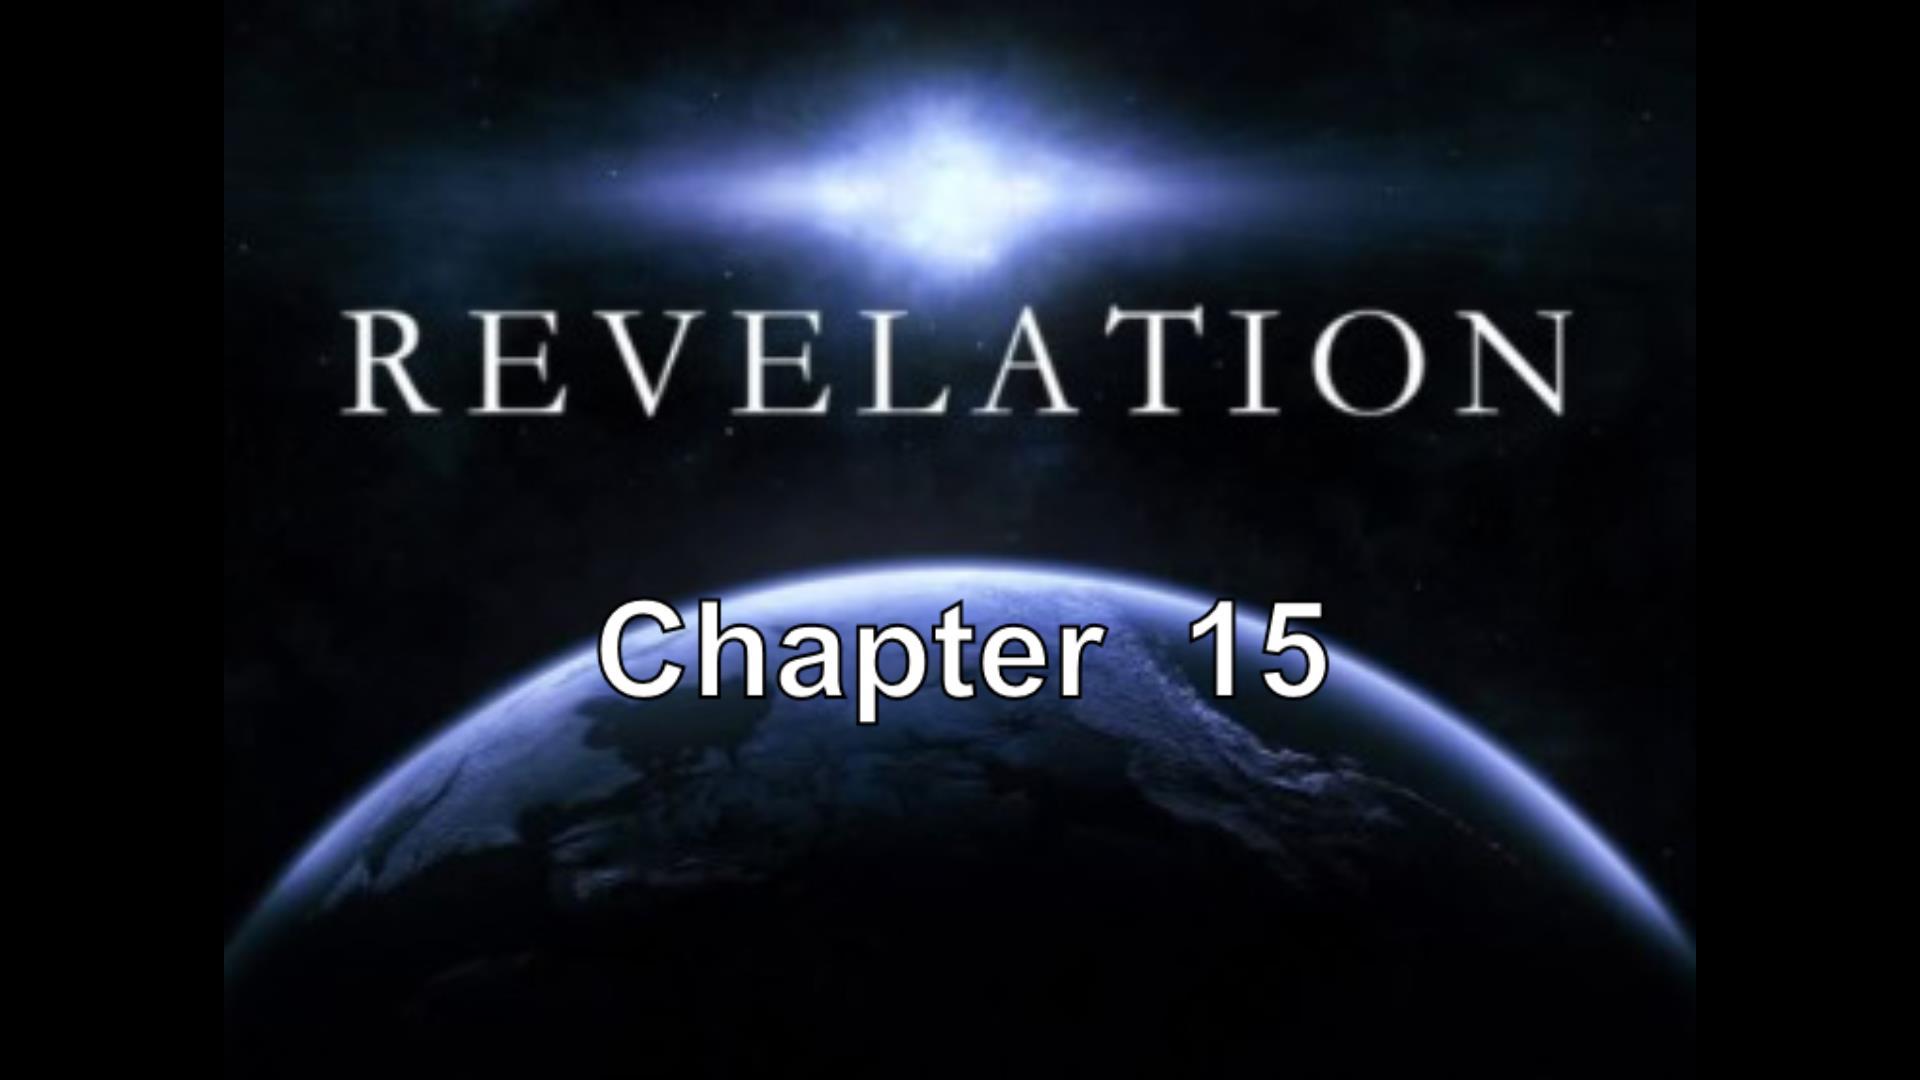 REVELATION 15